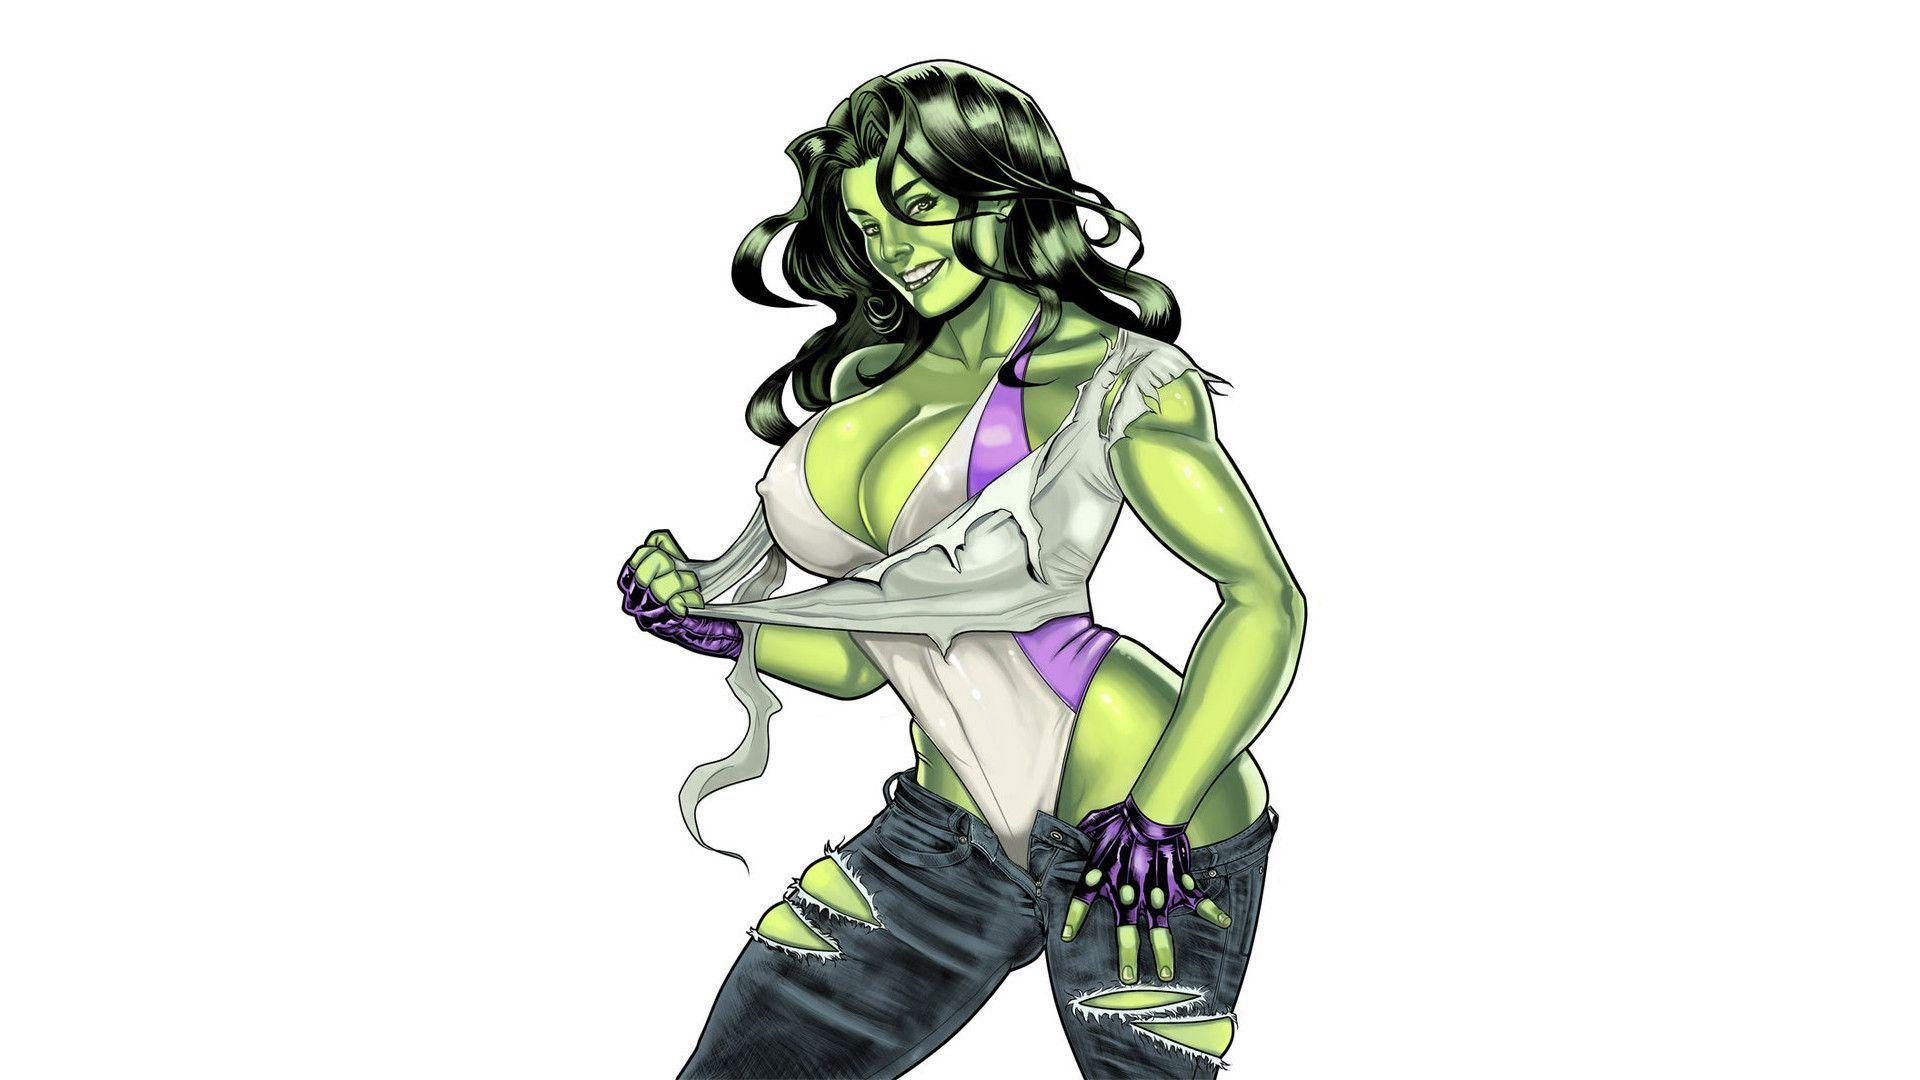 She Hulk Wallpaper Image Group 42 1920x1080